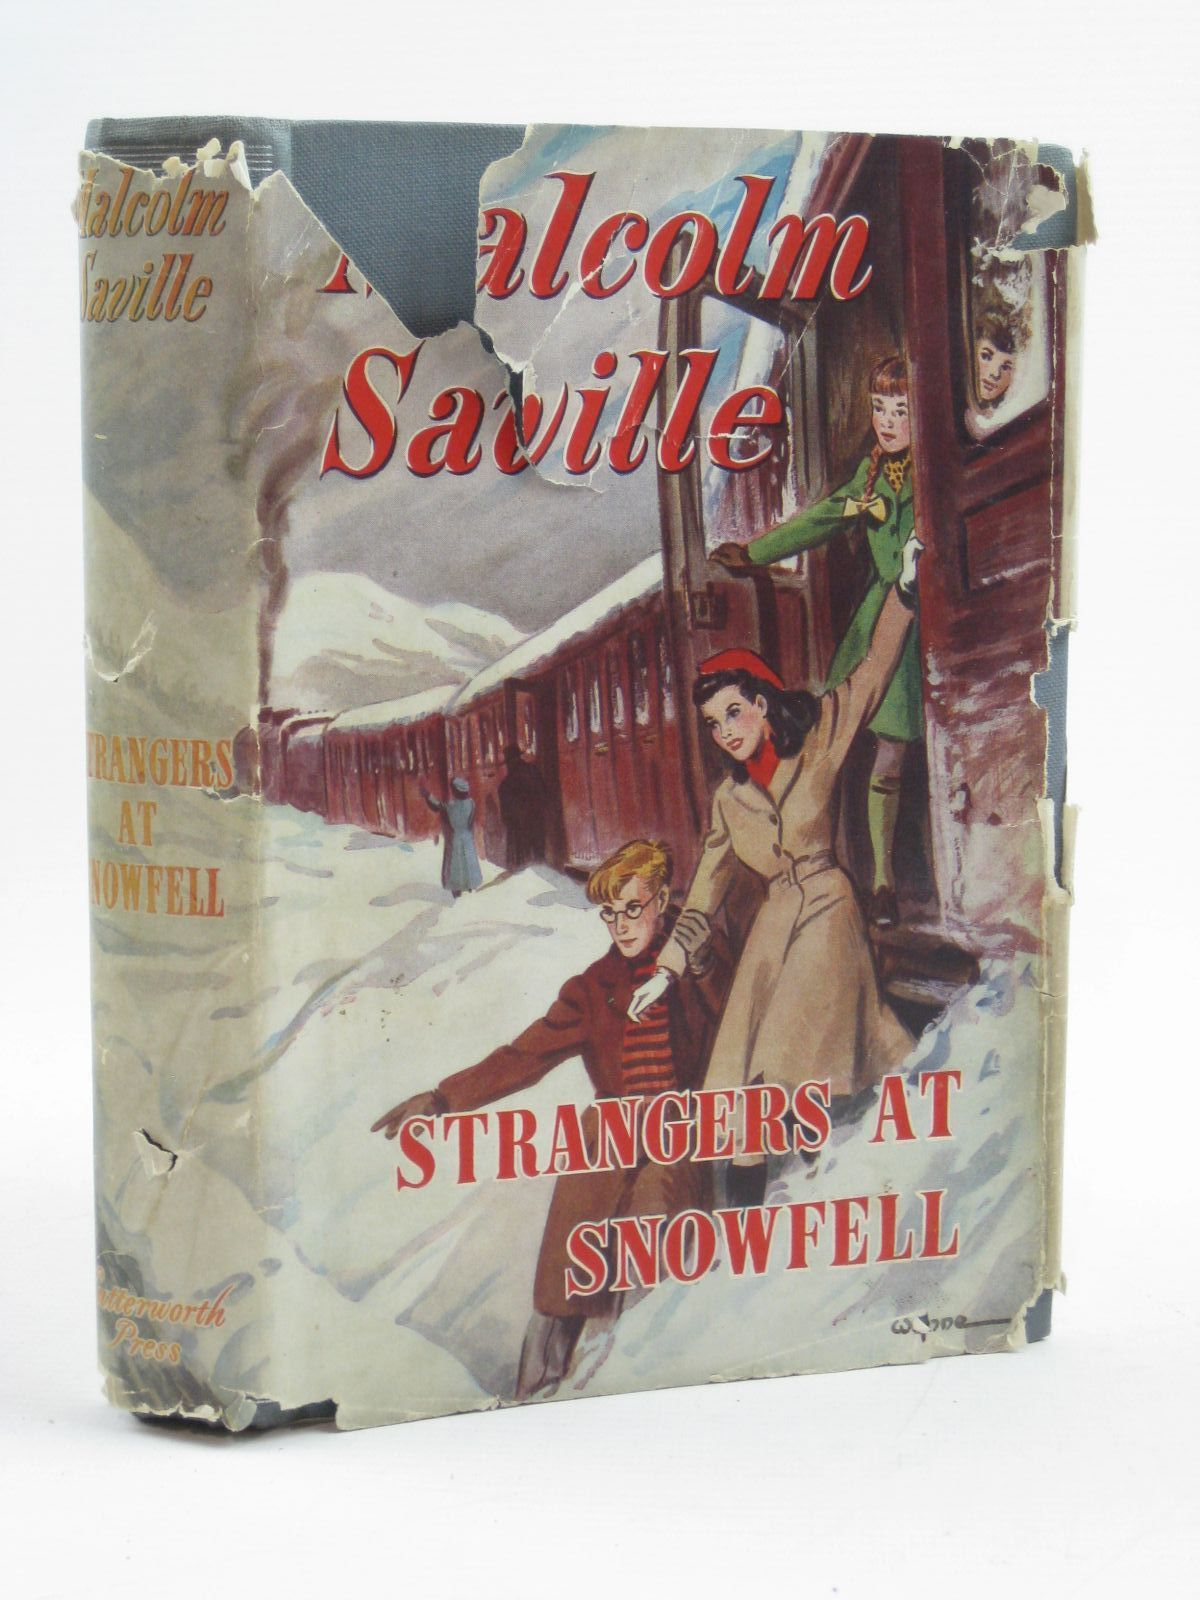 Strangers At Snowfell